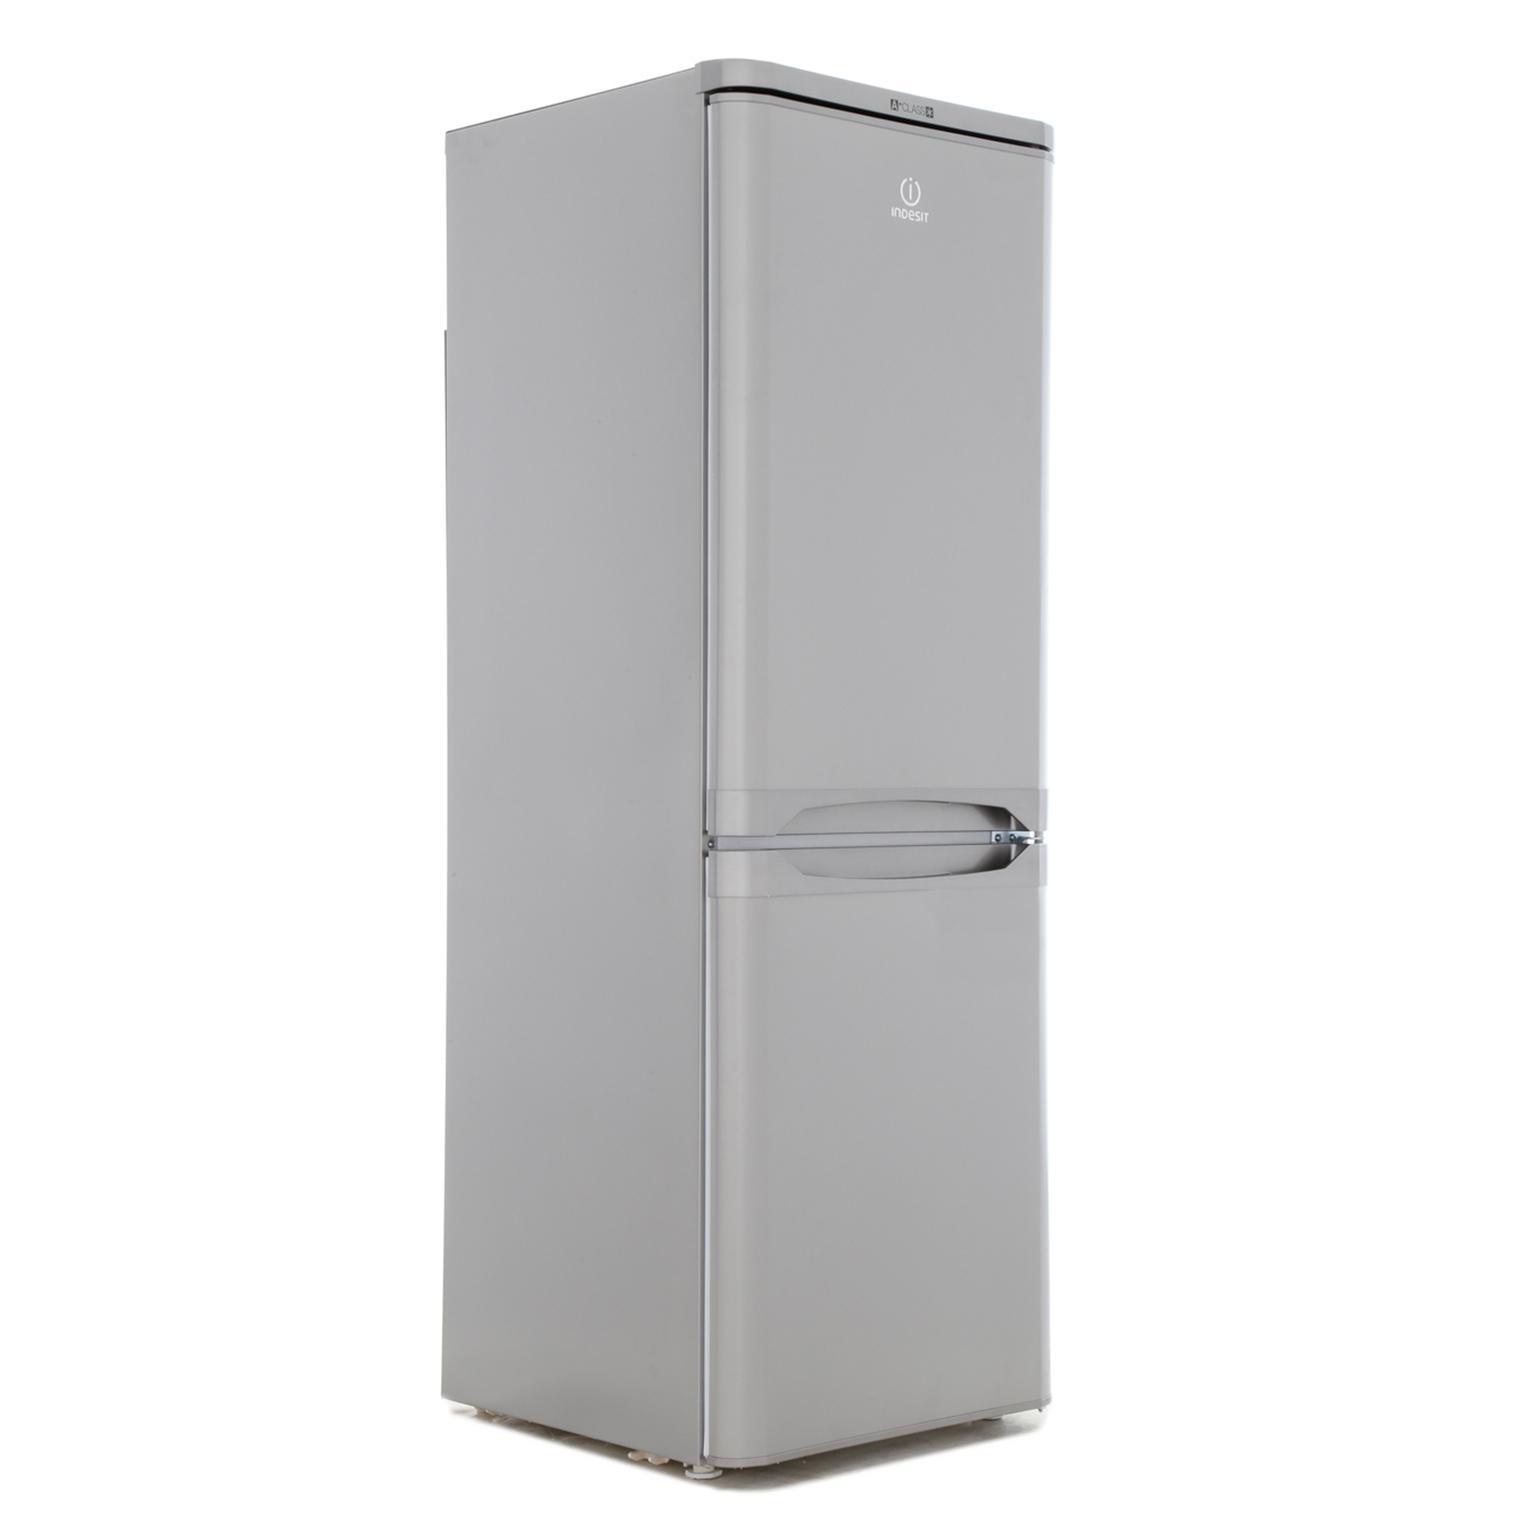 Indesit Start Ncaa55suk Fridge Freezer Buy Online